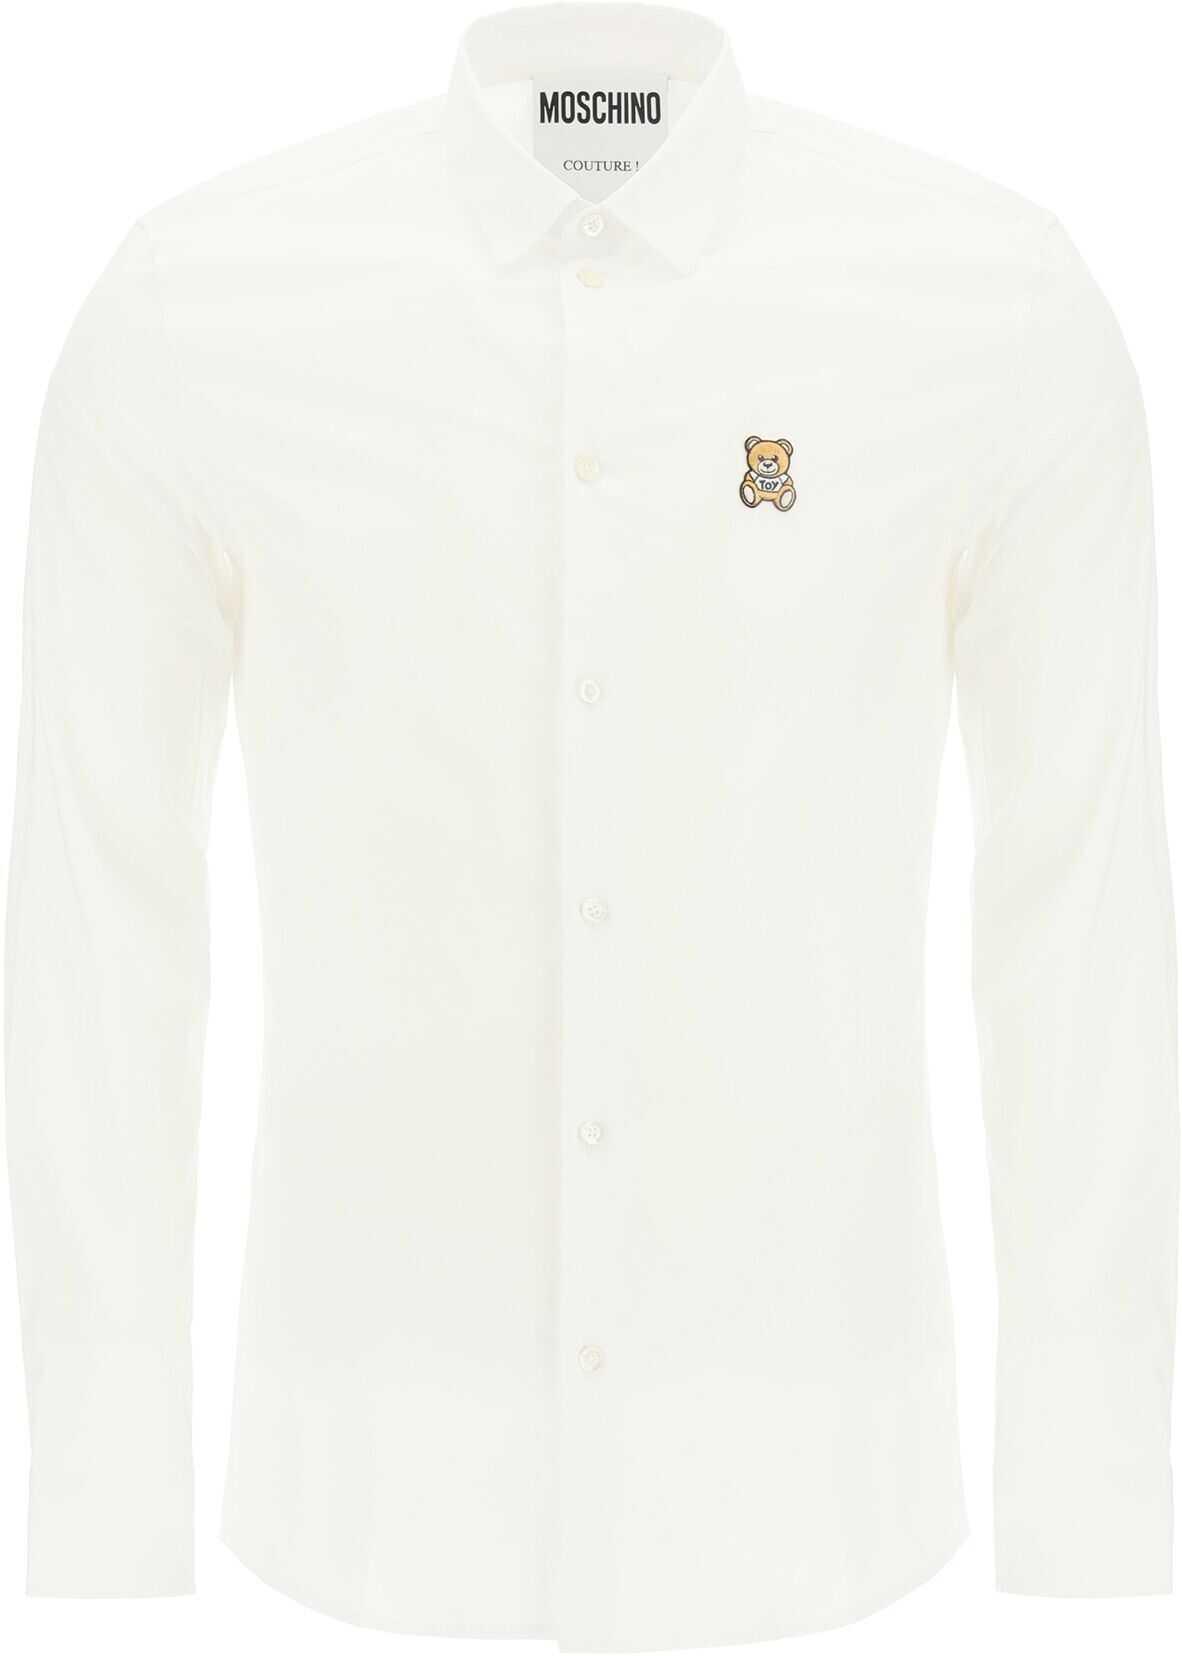 Moschino Teddy Bear Patch Shirt* FANTASIA BIANCO